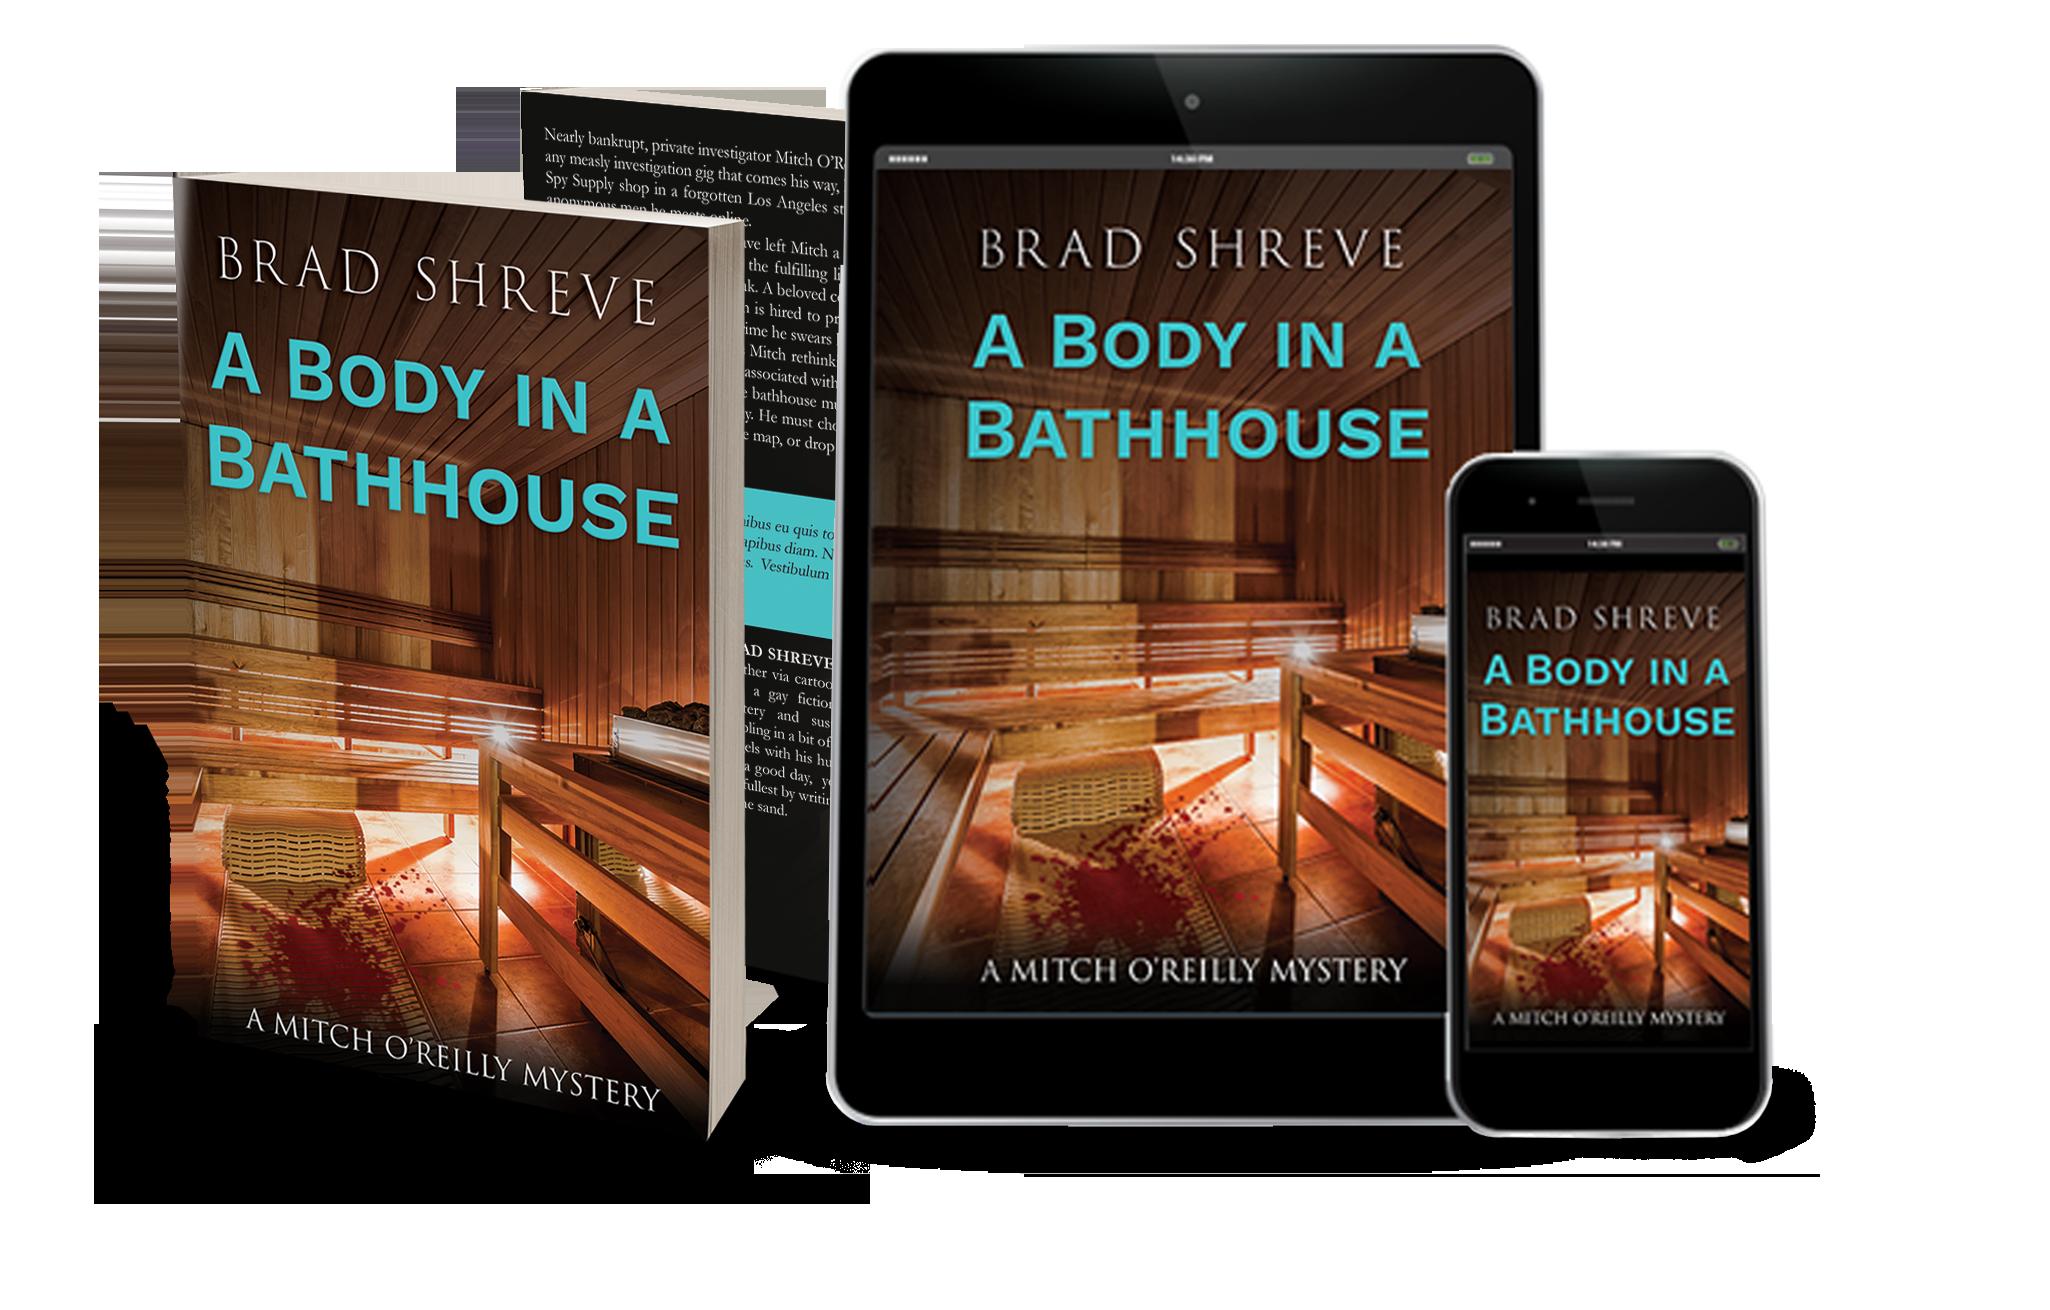 Book cover design for A Body in a Bathhouse